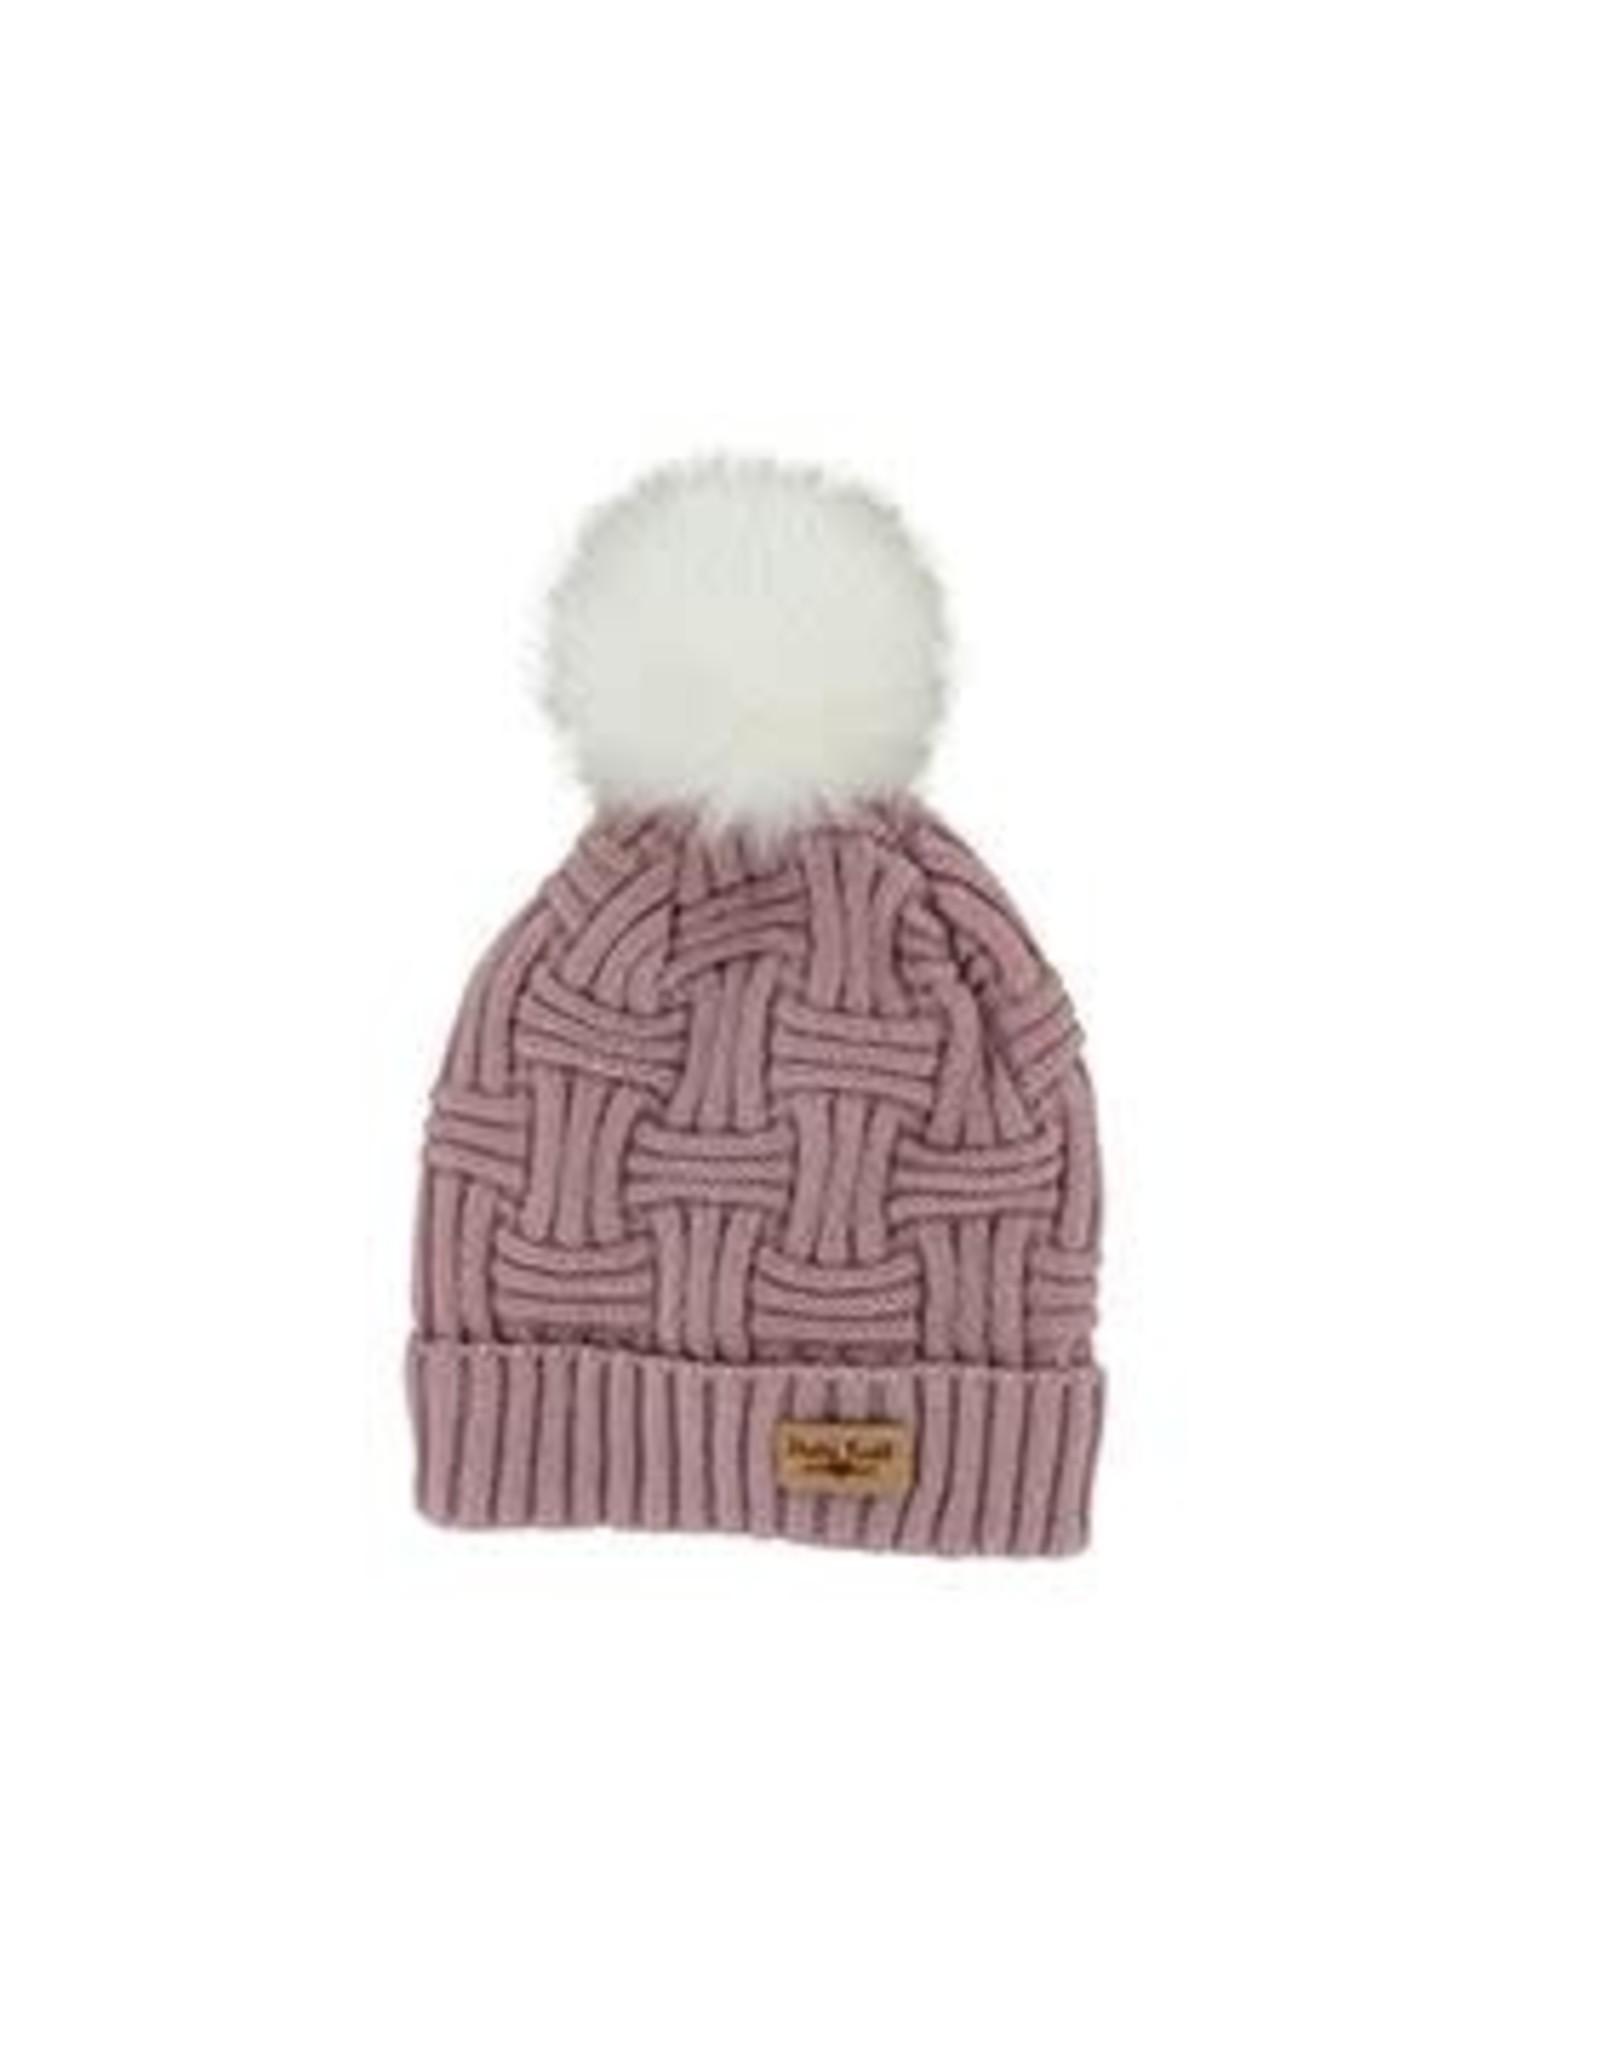 Lined Knit Hat with Pom Pom - Blush